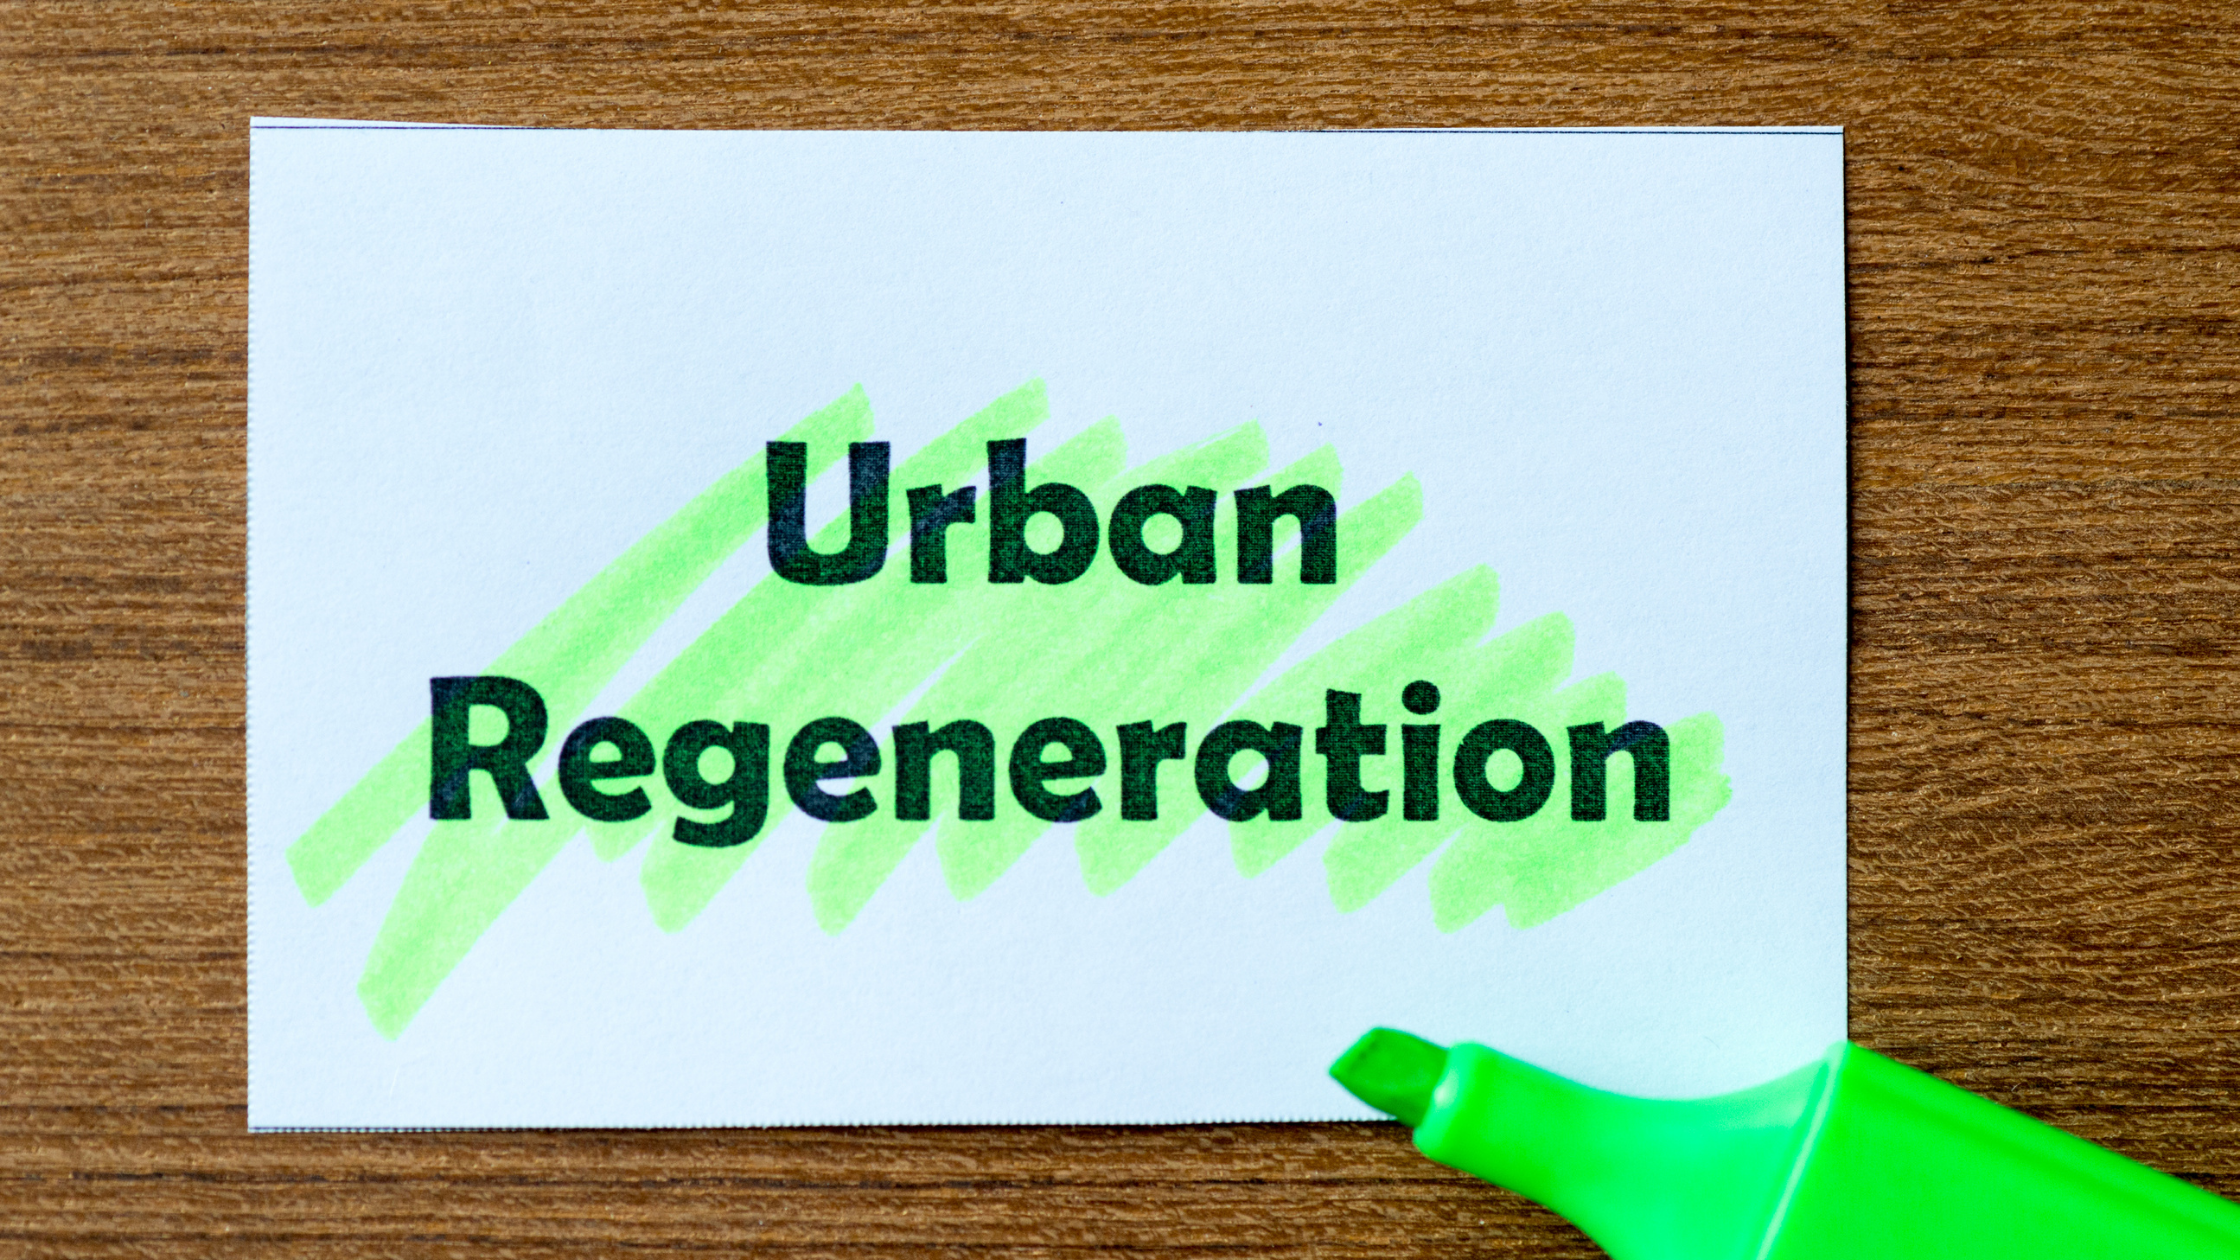 The Top 5 UK Urban Regeneration Hotspots